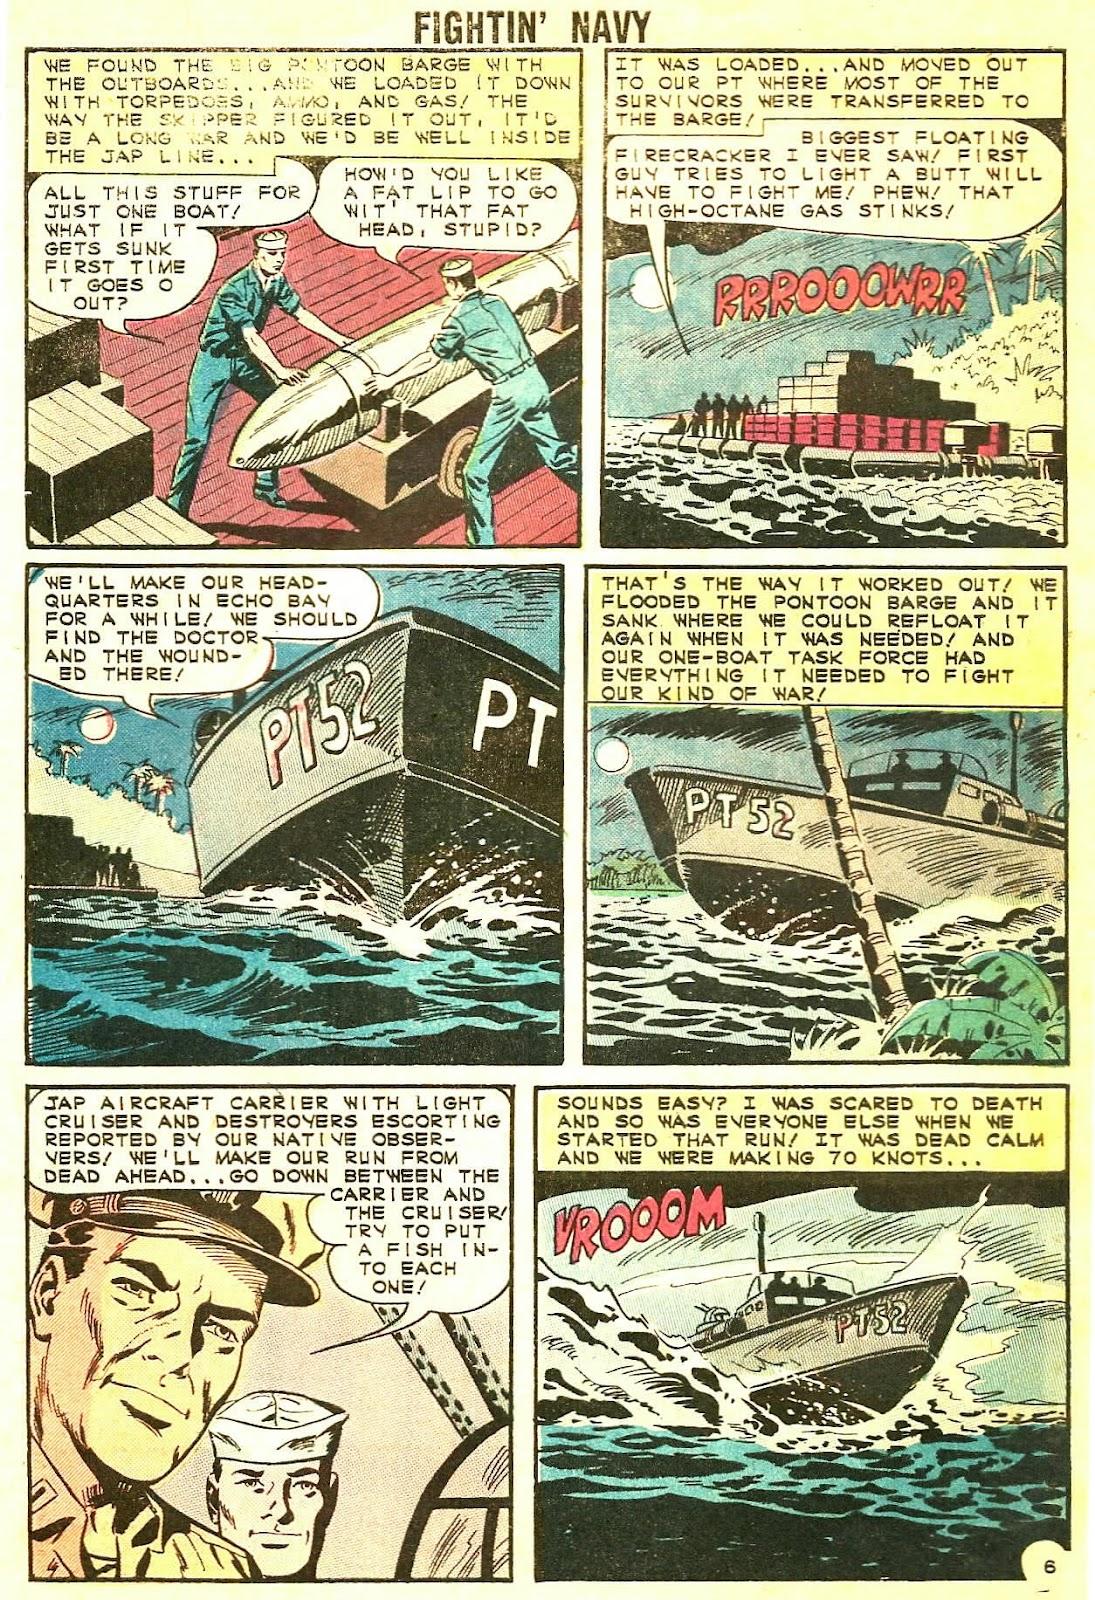 Read online Fightin' Navy comic -  Issue #115 - 32